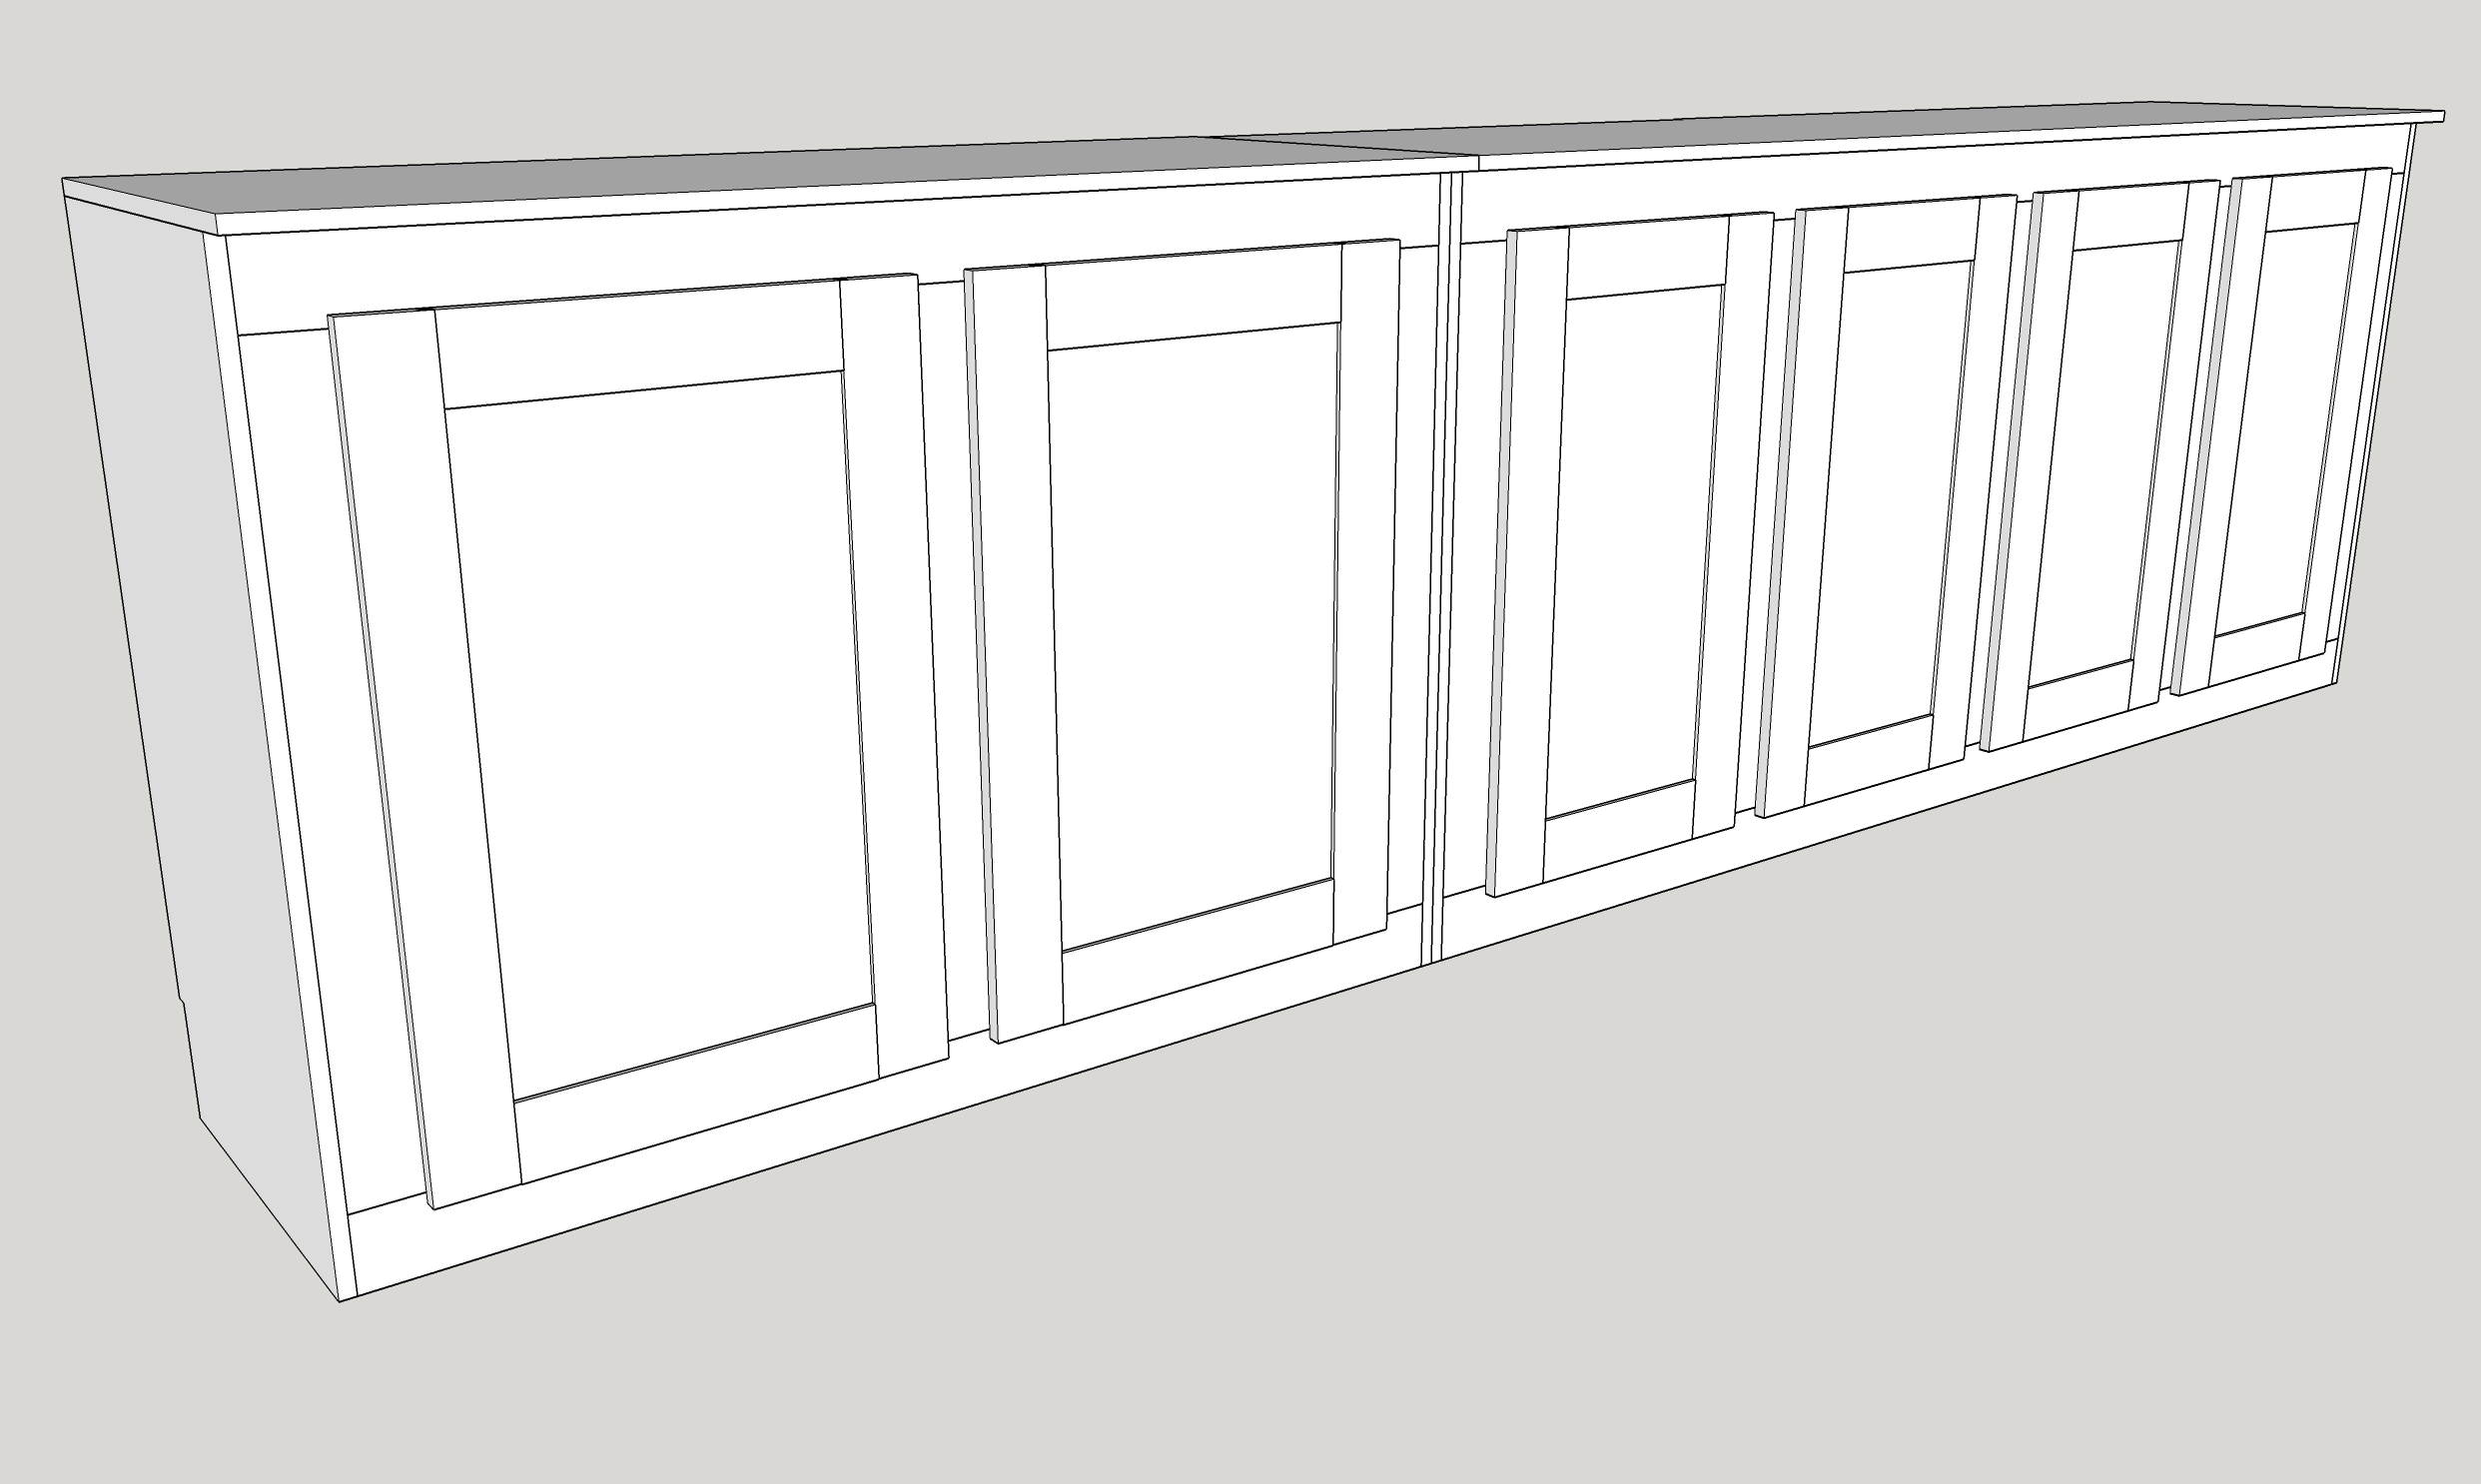 Click image for larger version.  Name:Garage Kitchen Gadget Cabinet - New 1.jpg Views:13 Size:475.3 KB ID:335266